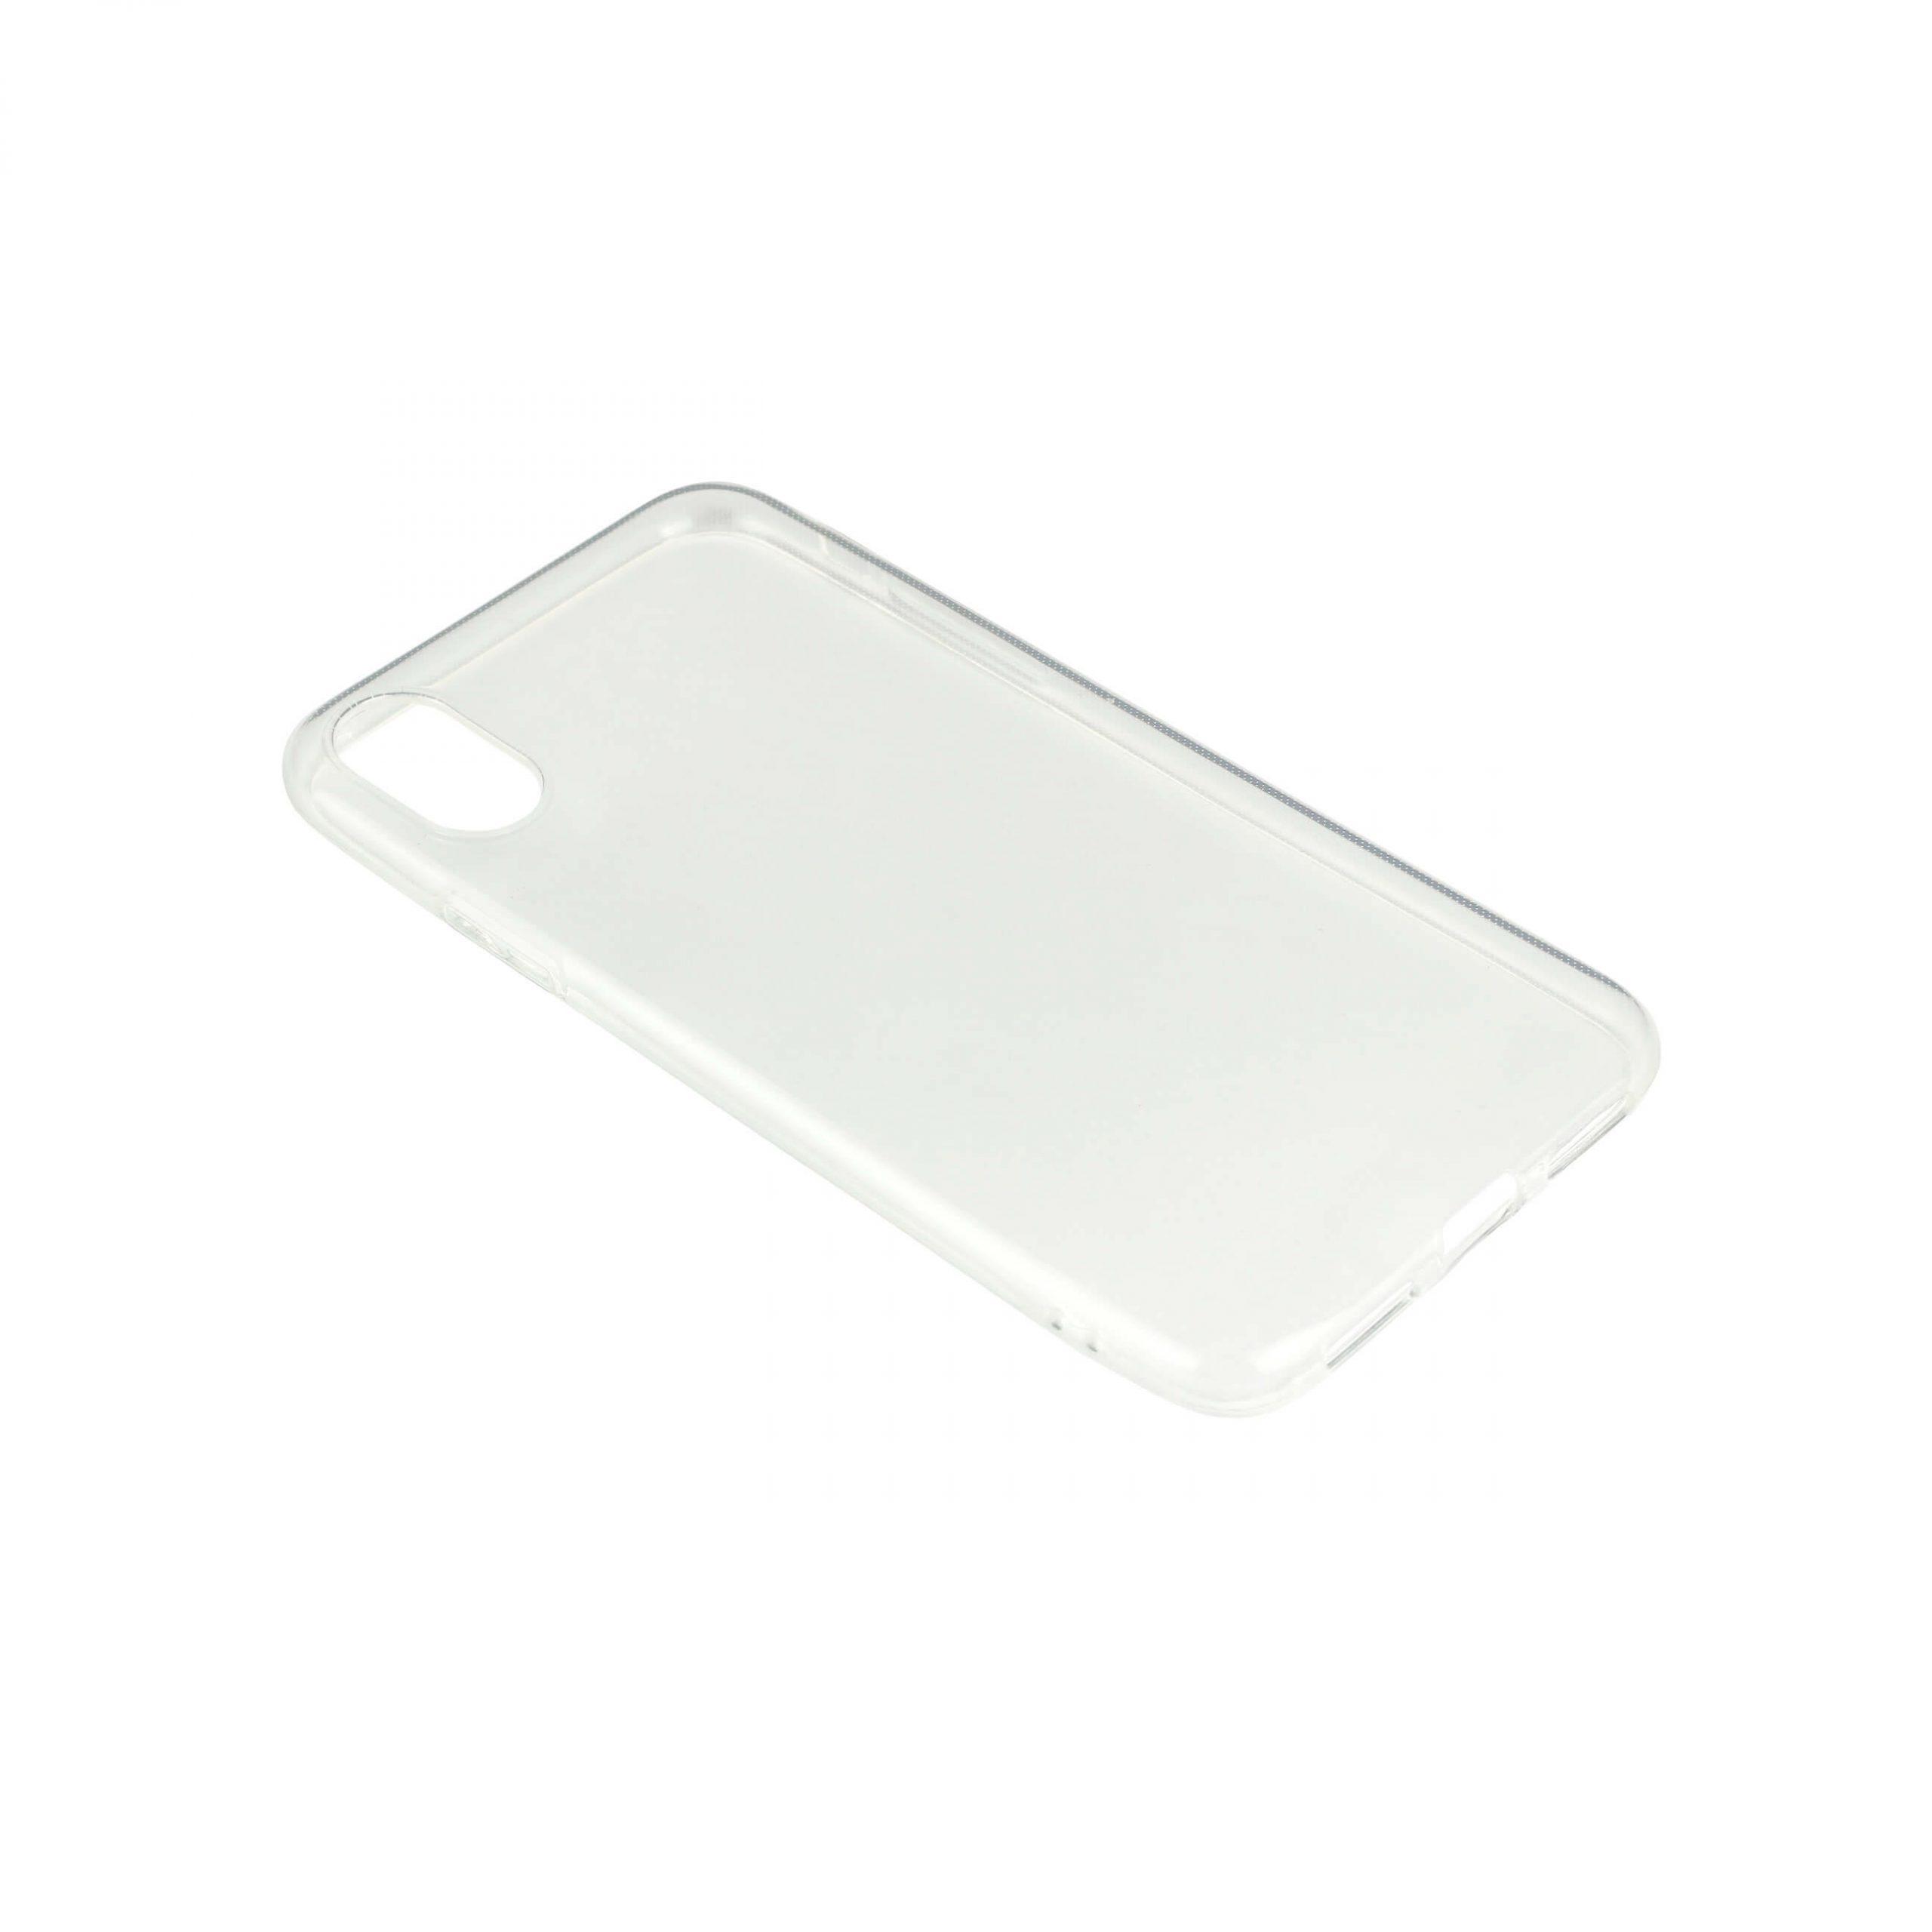 GEAR iPhone X/Xs Mobilskal Transparent TPU